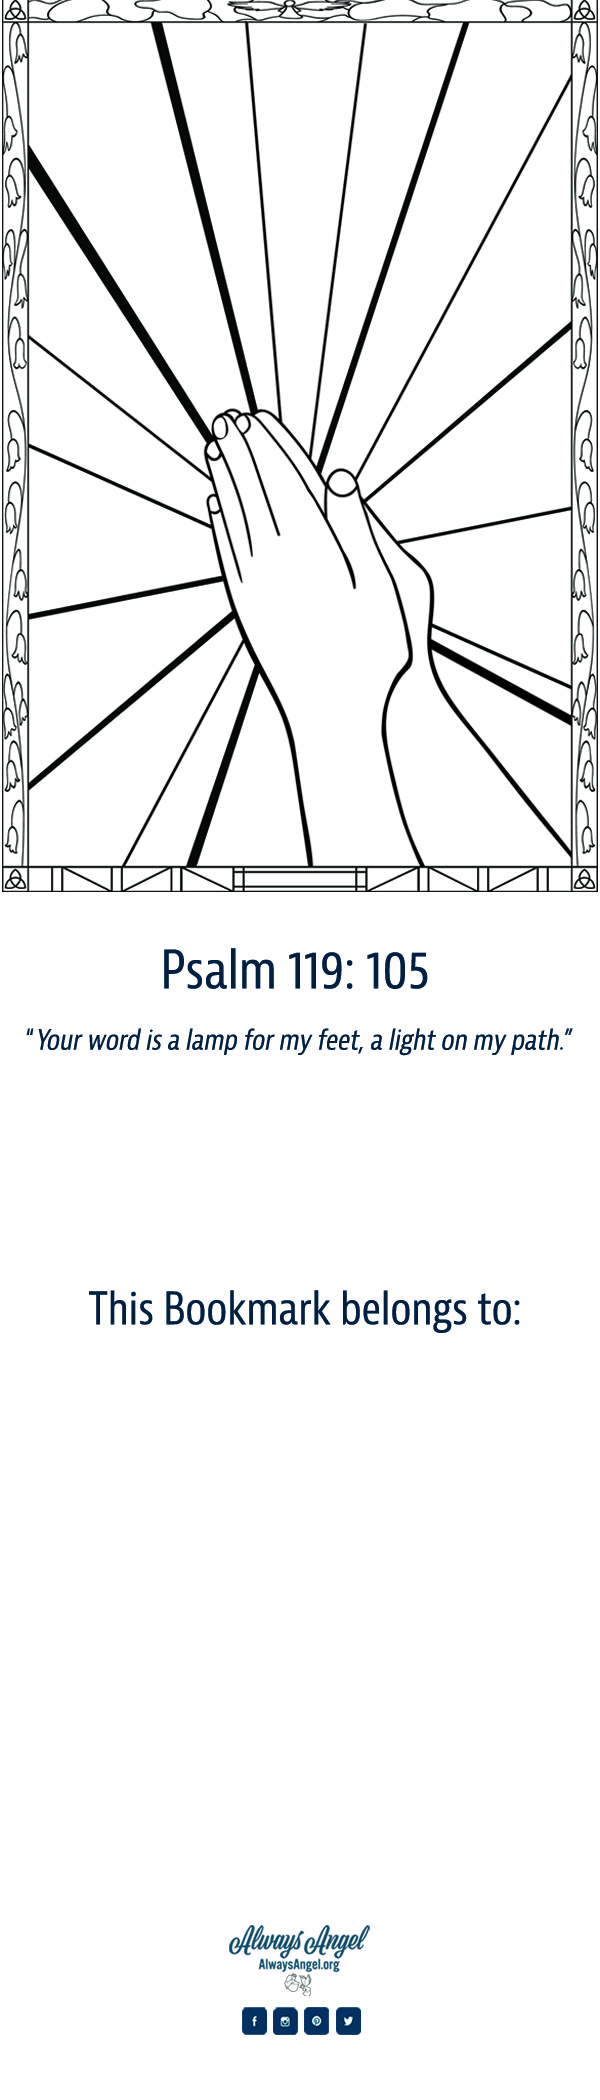 bookmark-prayerhands.jpg